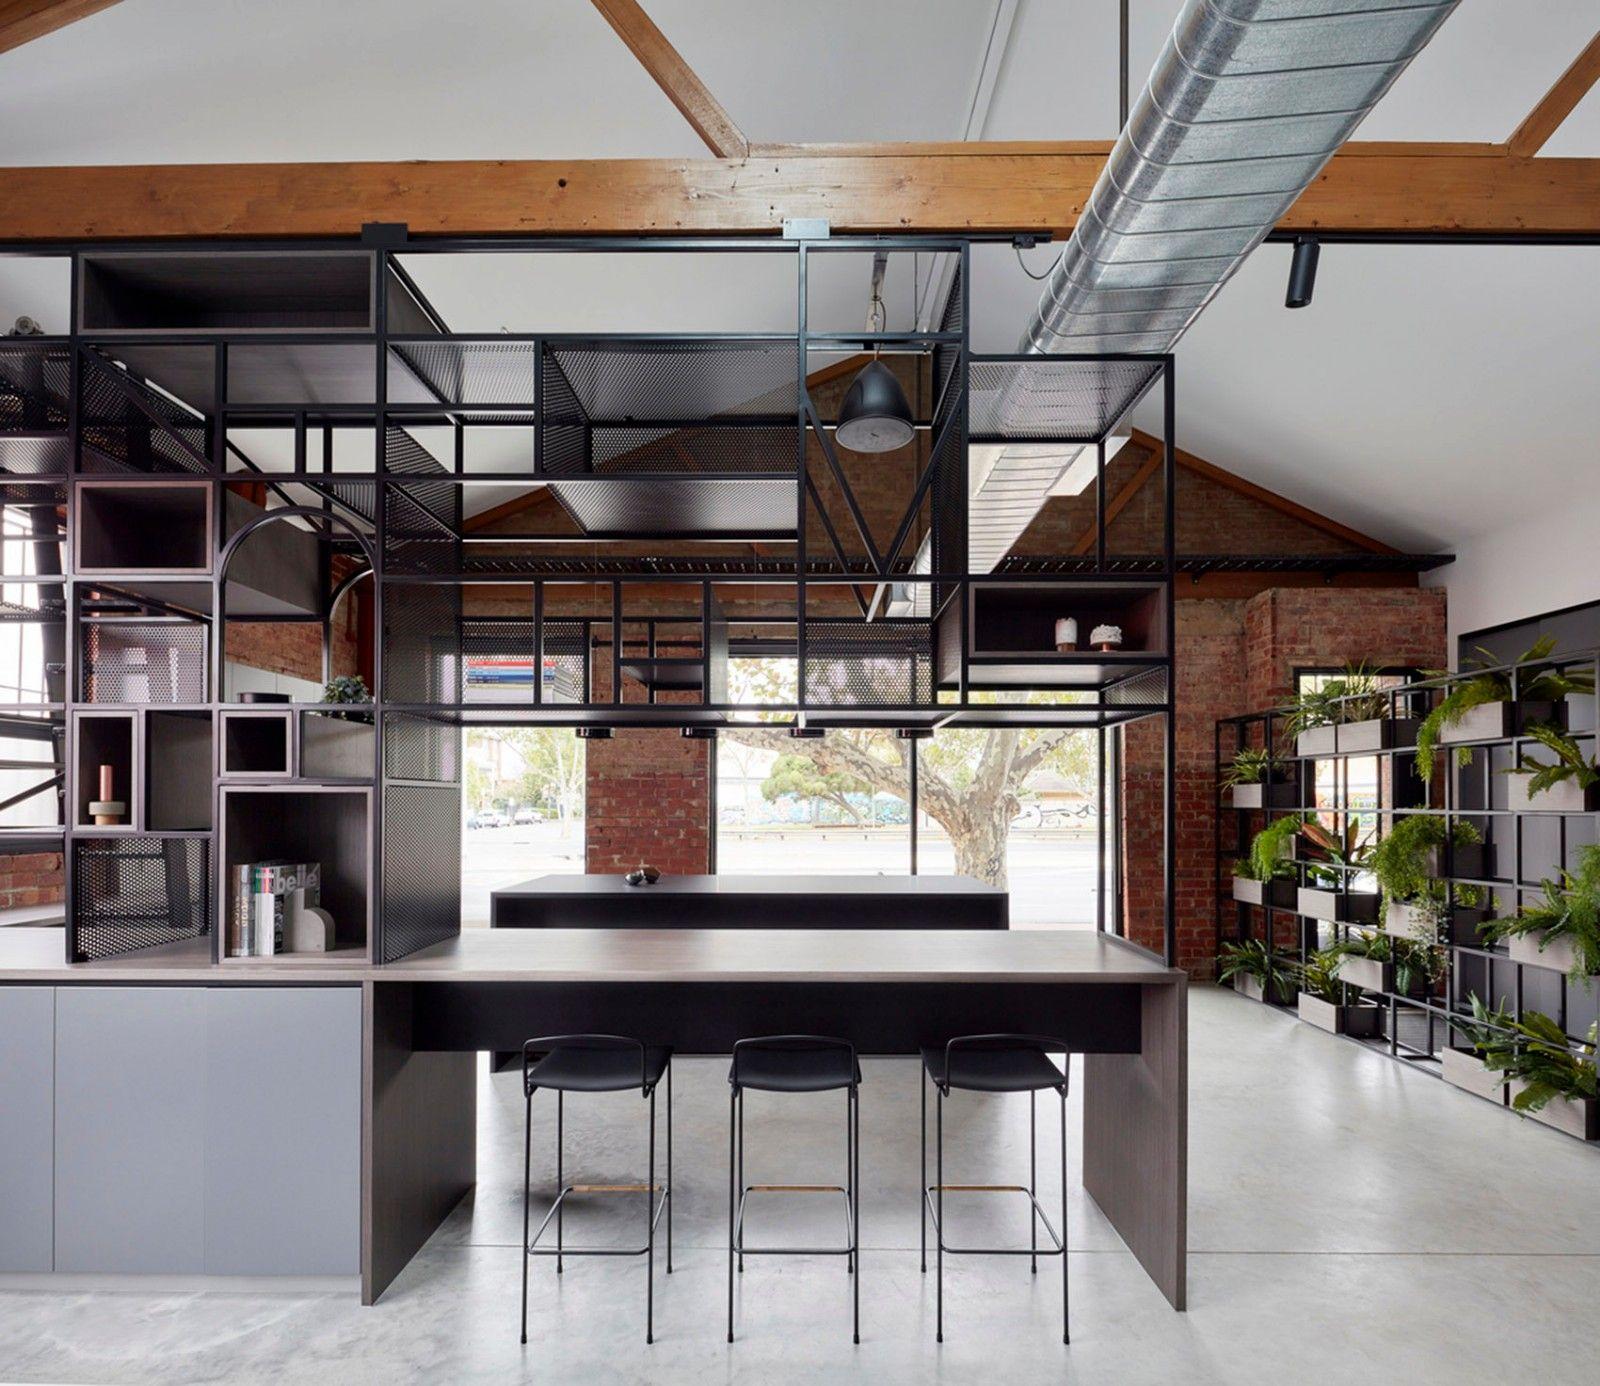 澳大利亚Studio 103设计工作室 | Studio 103|Studio 103 - 2